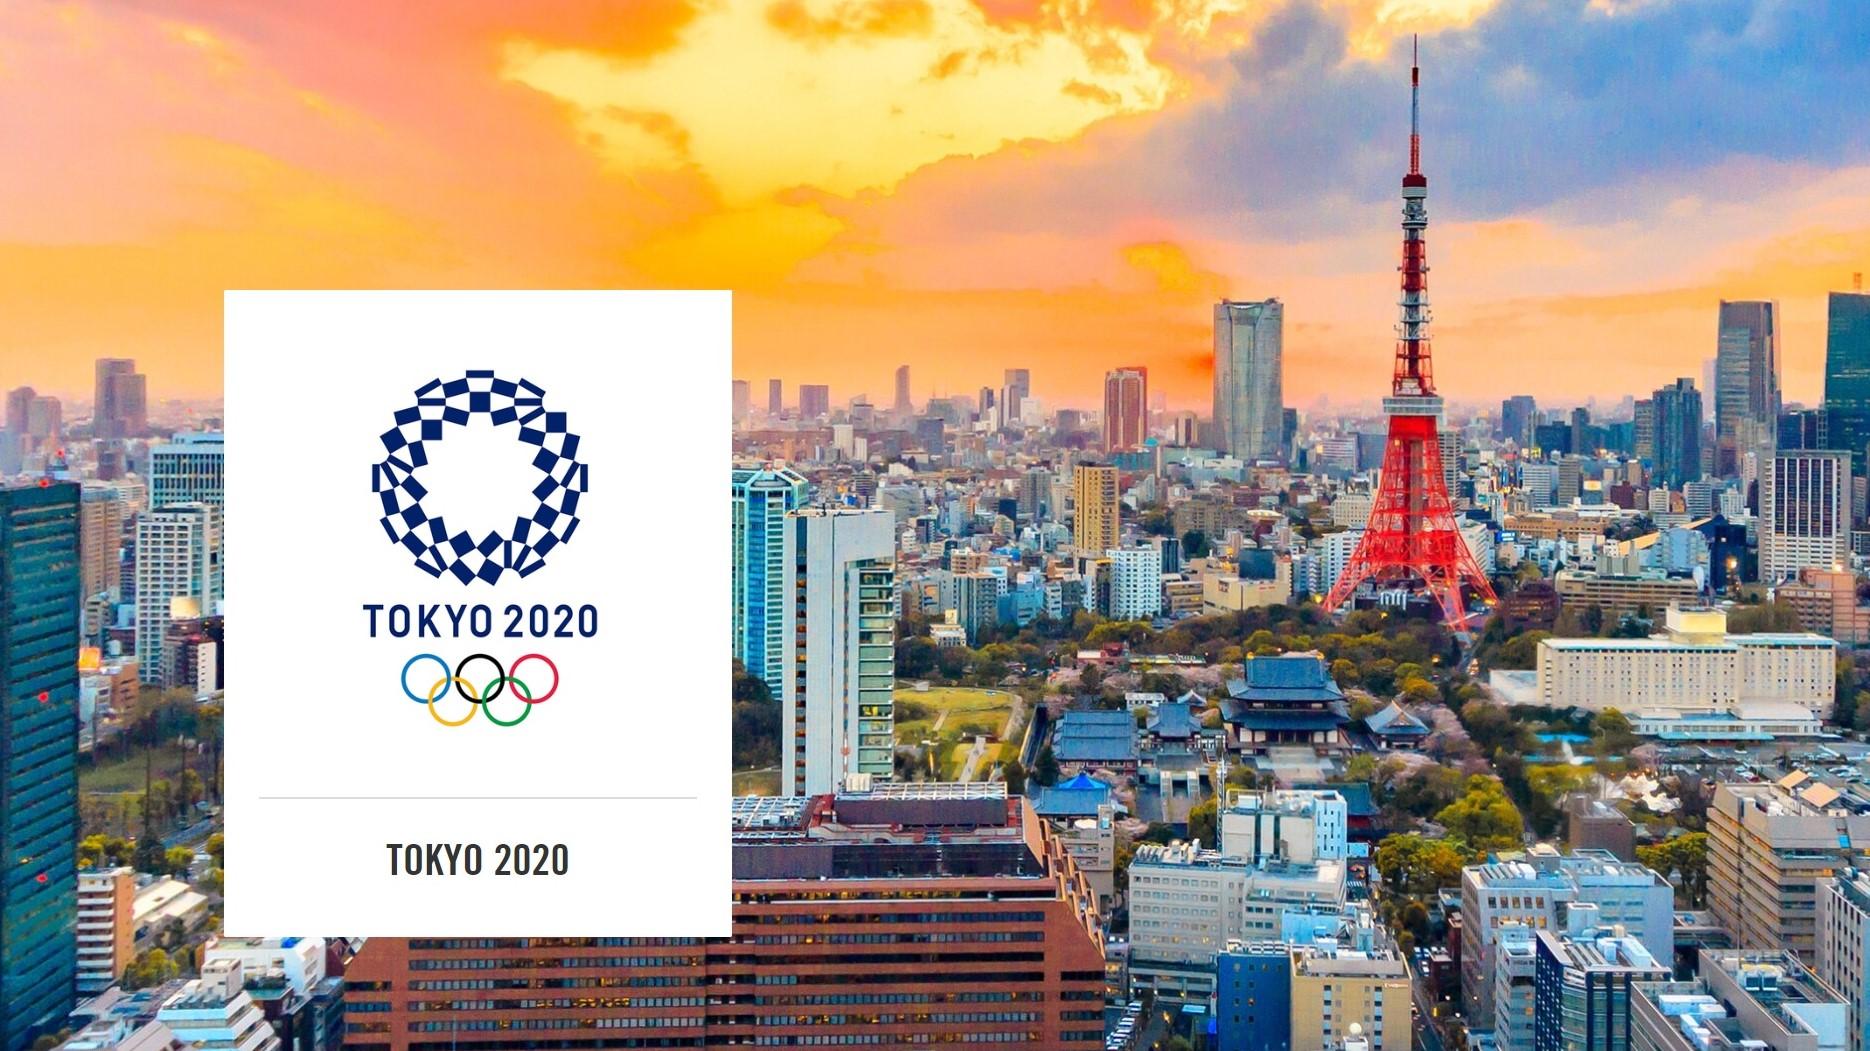 False start: the Tokyo Olympics dates shift to 2021 due to coronavirus concerns